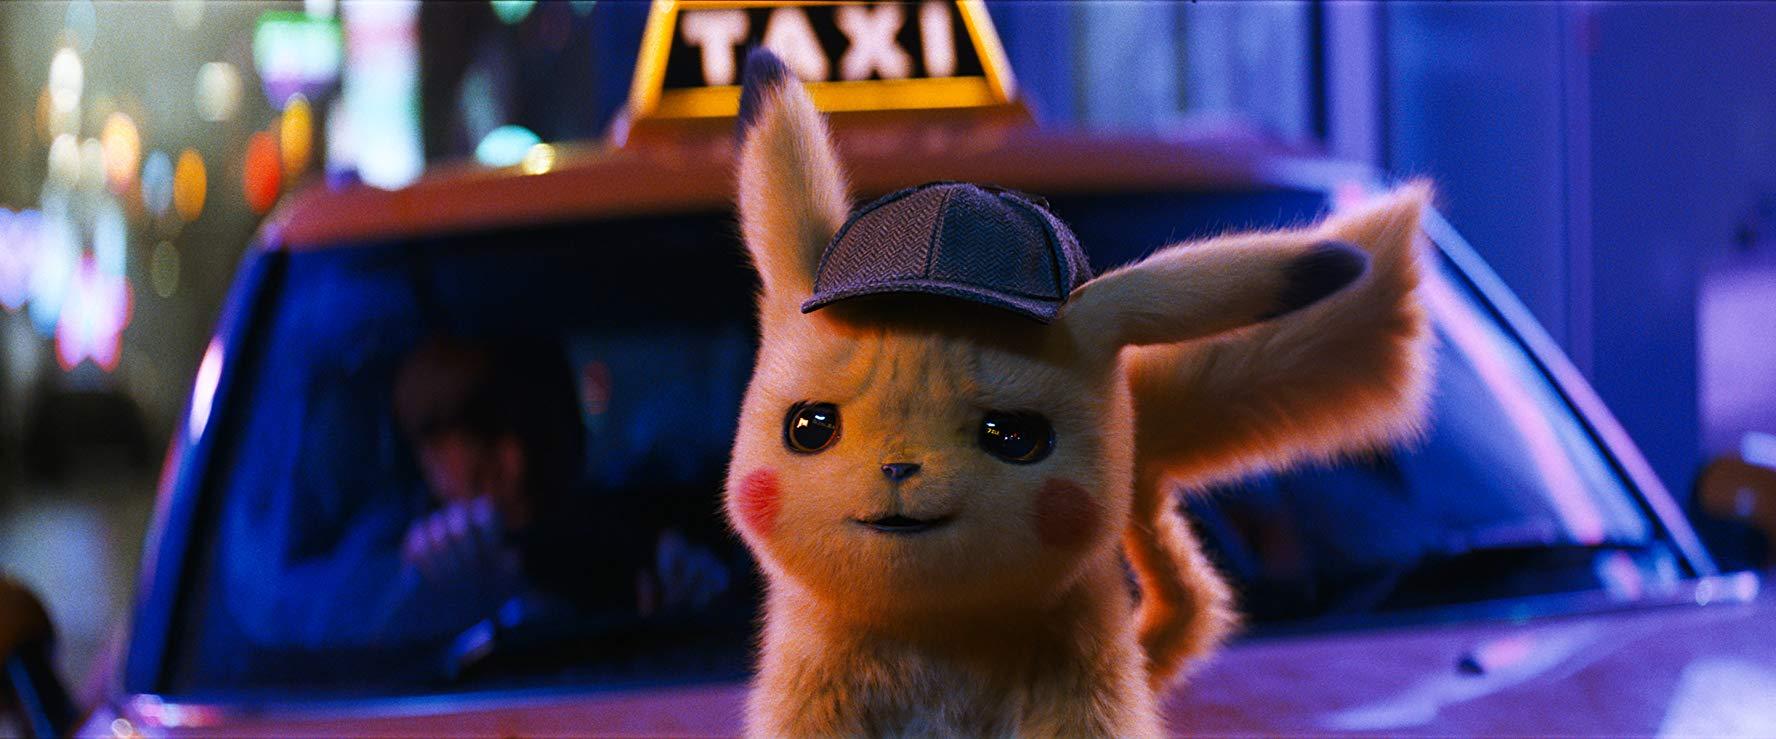 <em>Pokémon Detective Pikachu</em>: Cutesy Kid Fluff